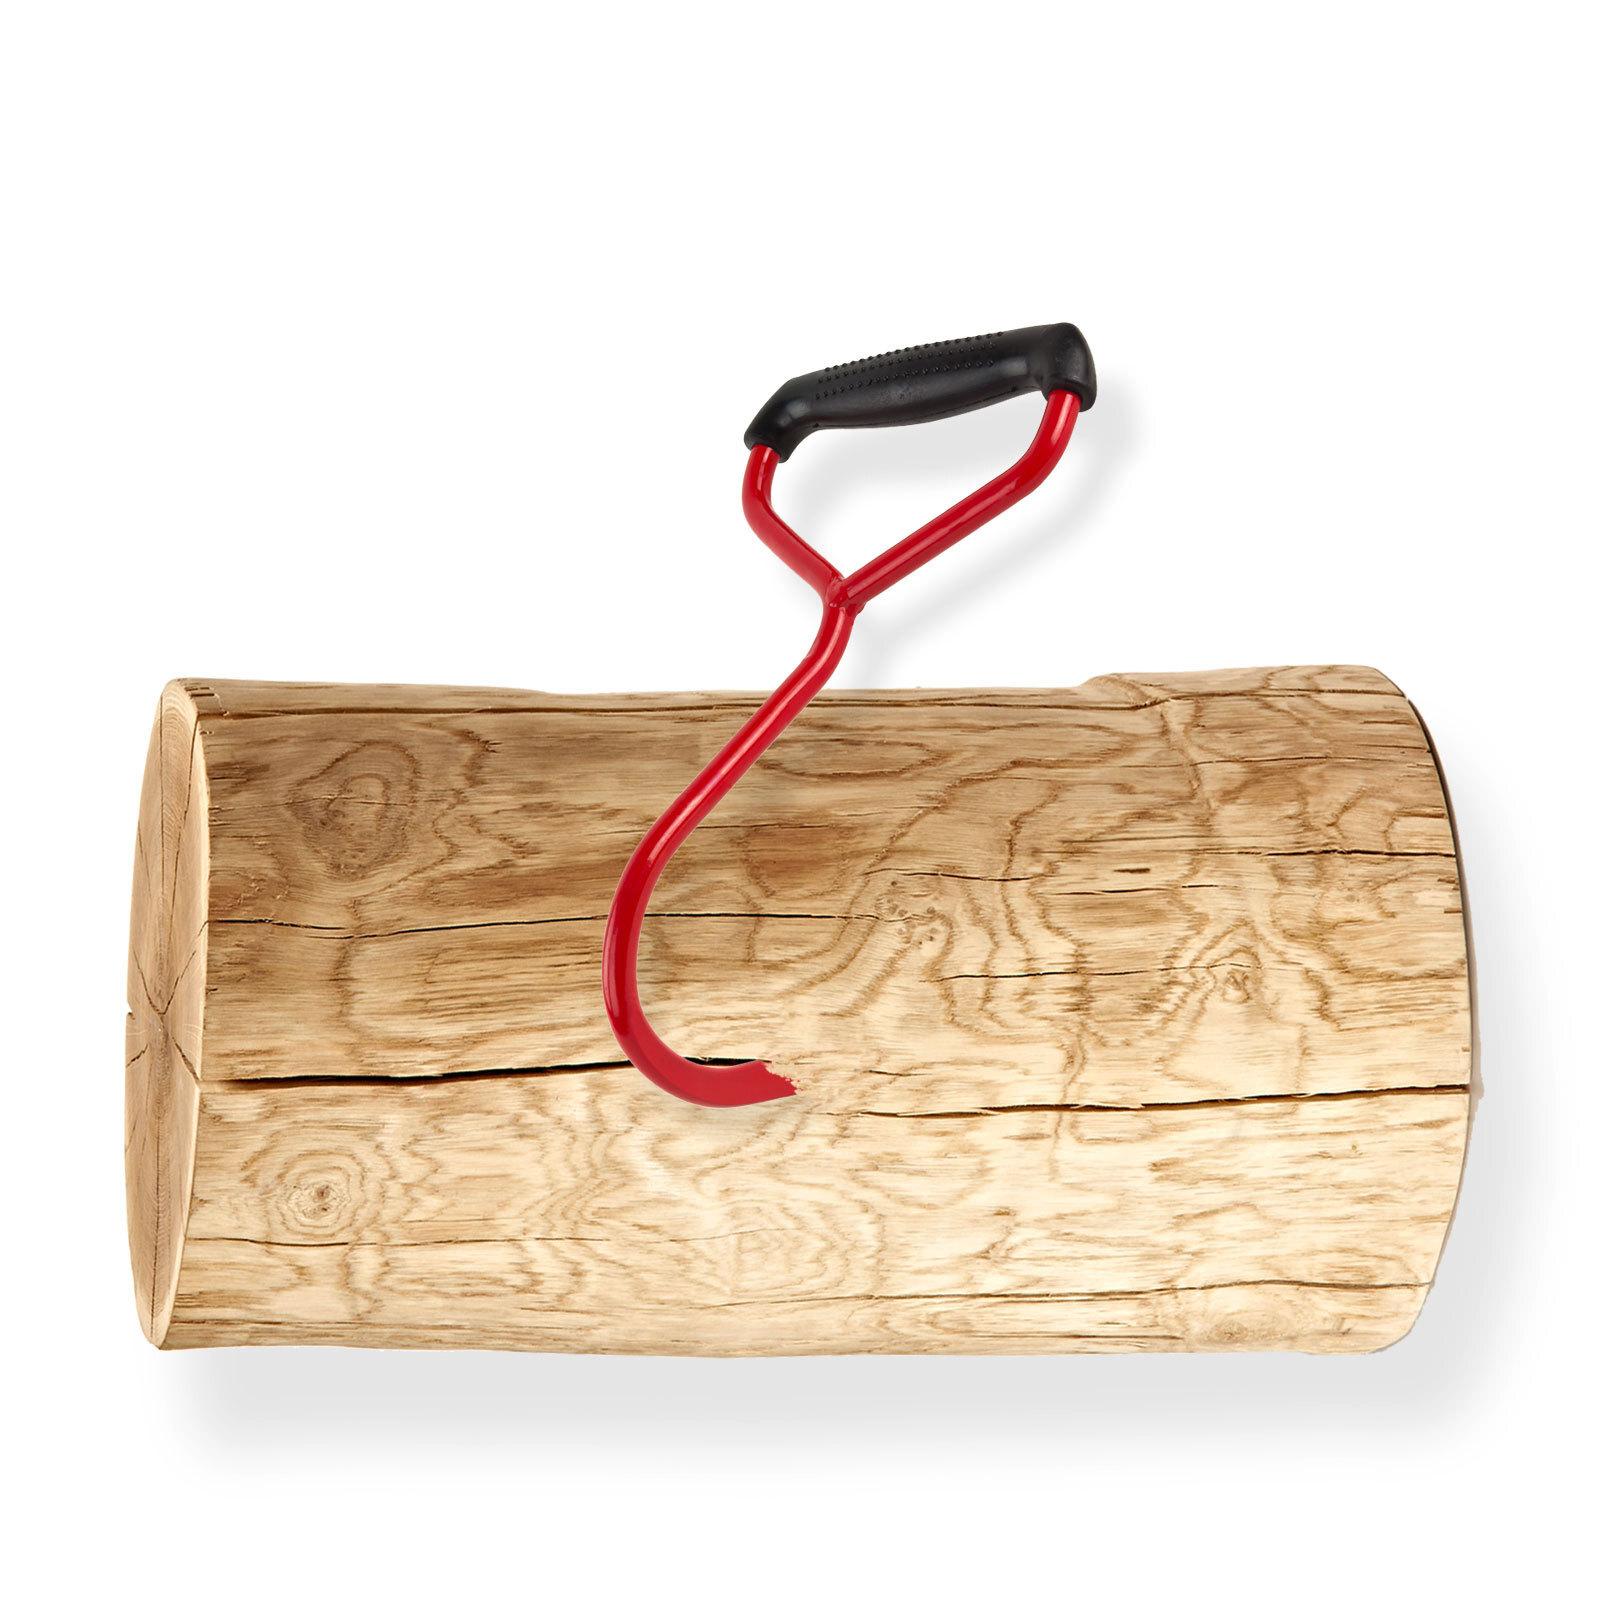 Universal Haken Forsthaken Packhaken Holz Hebehaken Transporthaken Sappie light